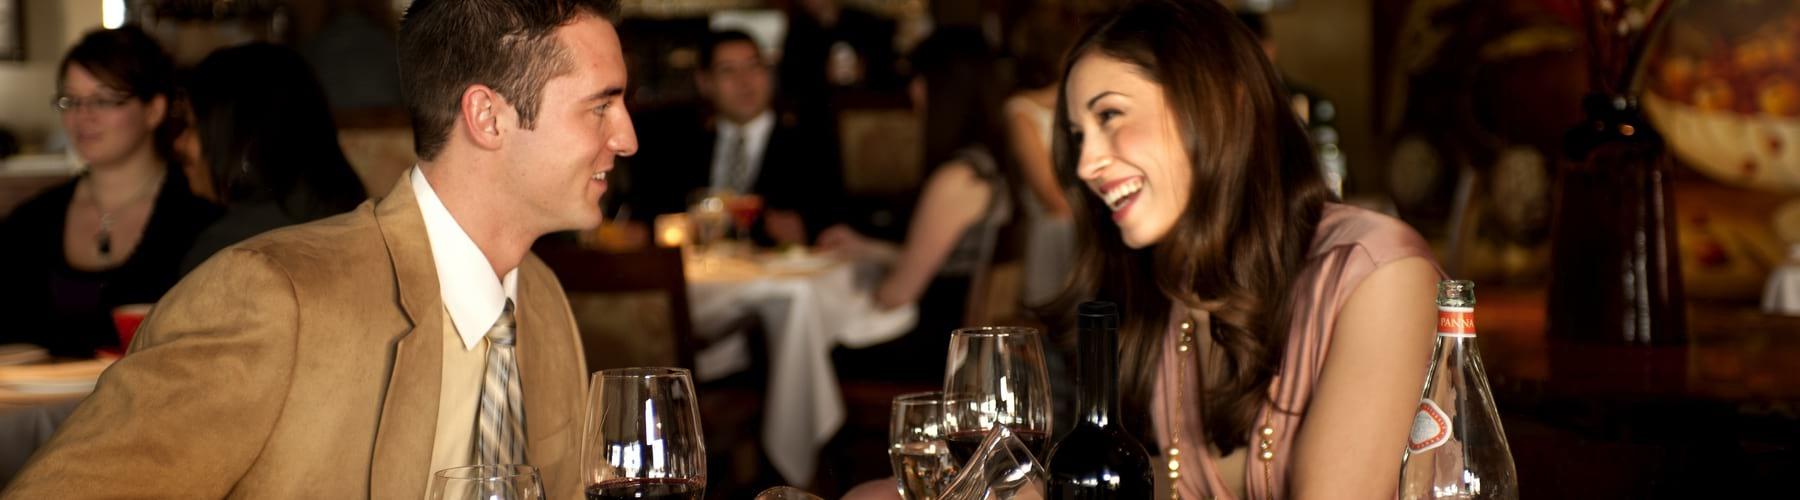 Romantic Dining Experience